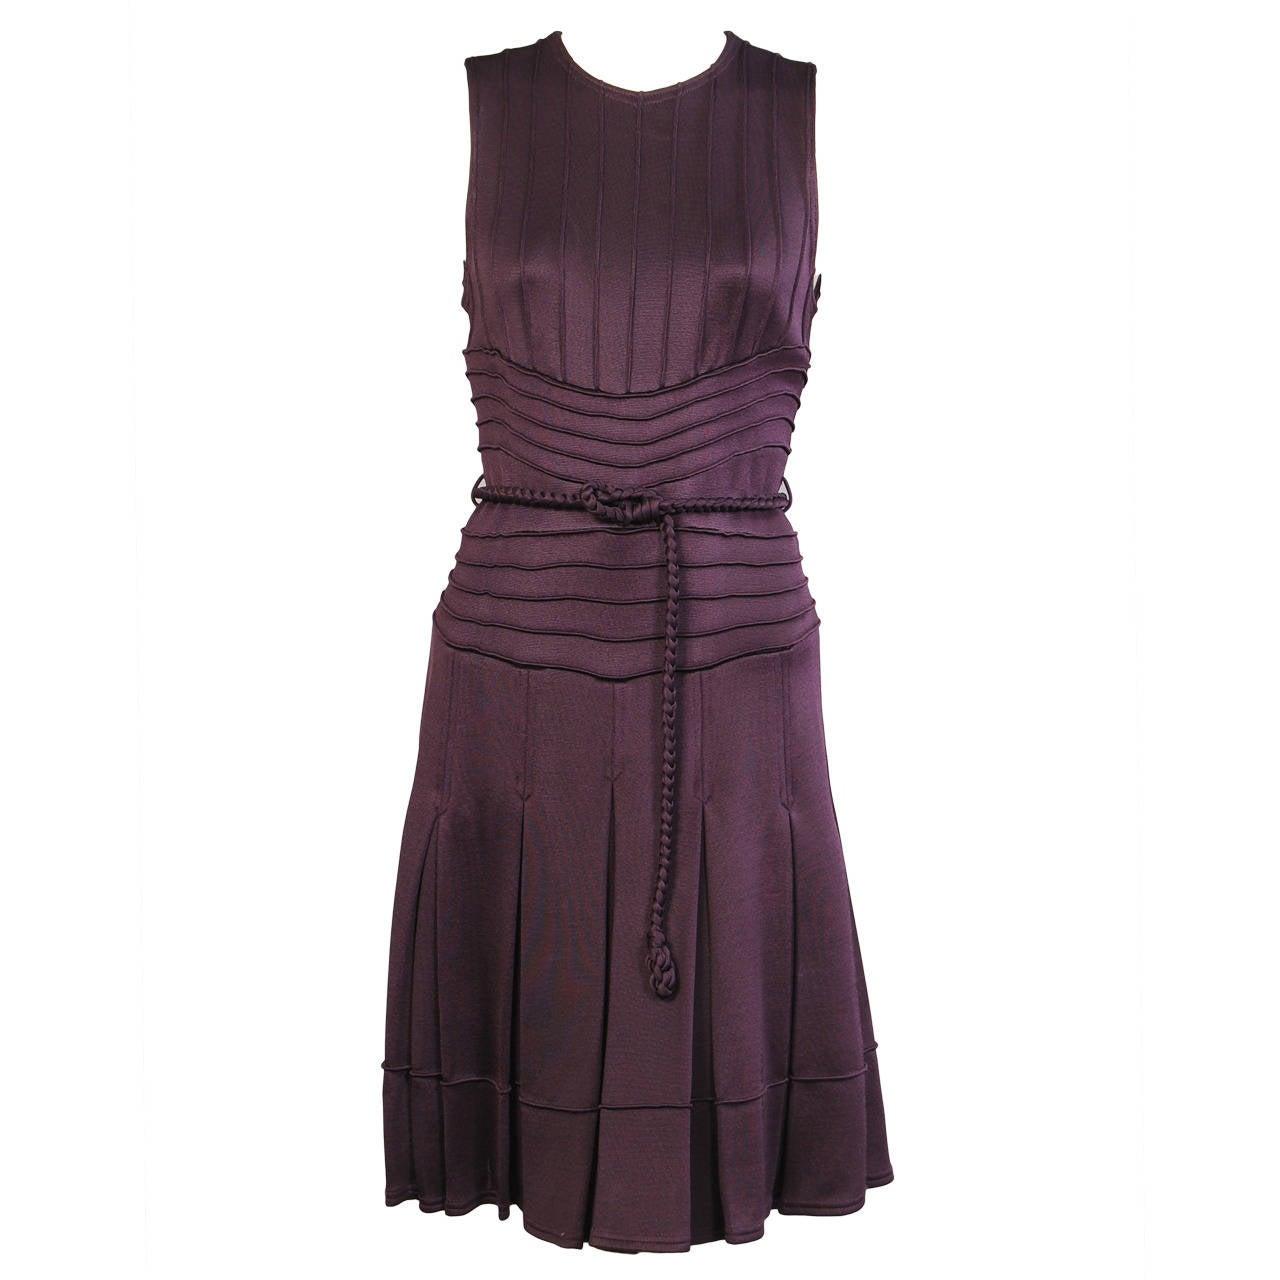 Chado Ralph Rucci Aubergine Silk Dress, Never Worn